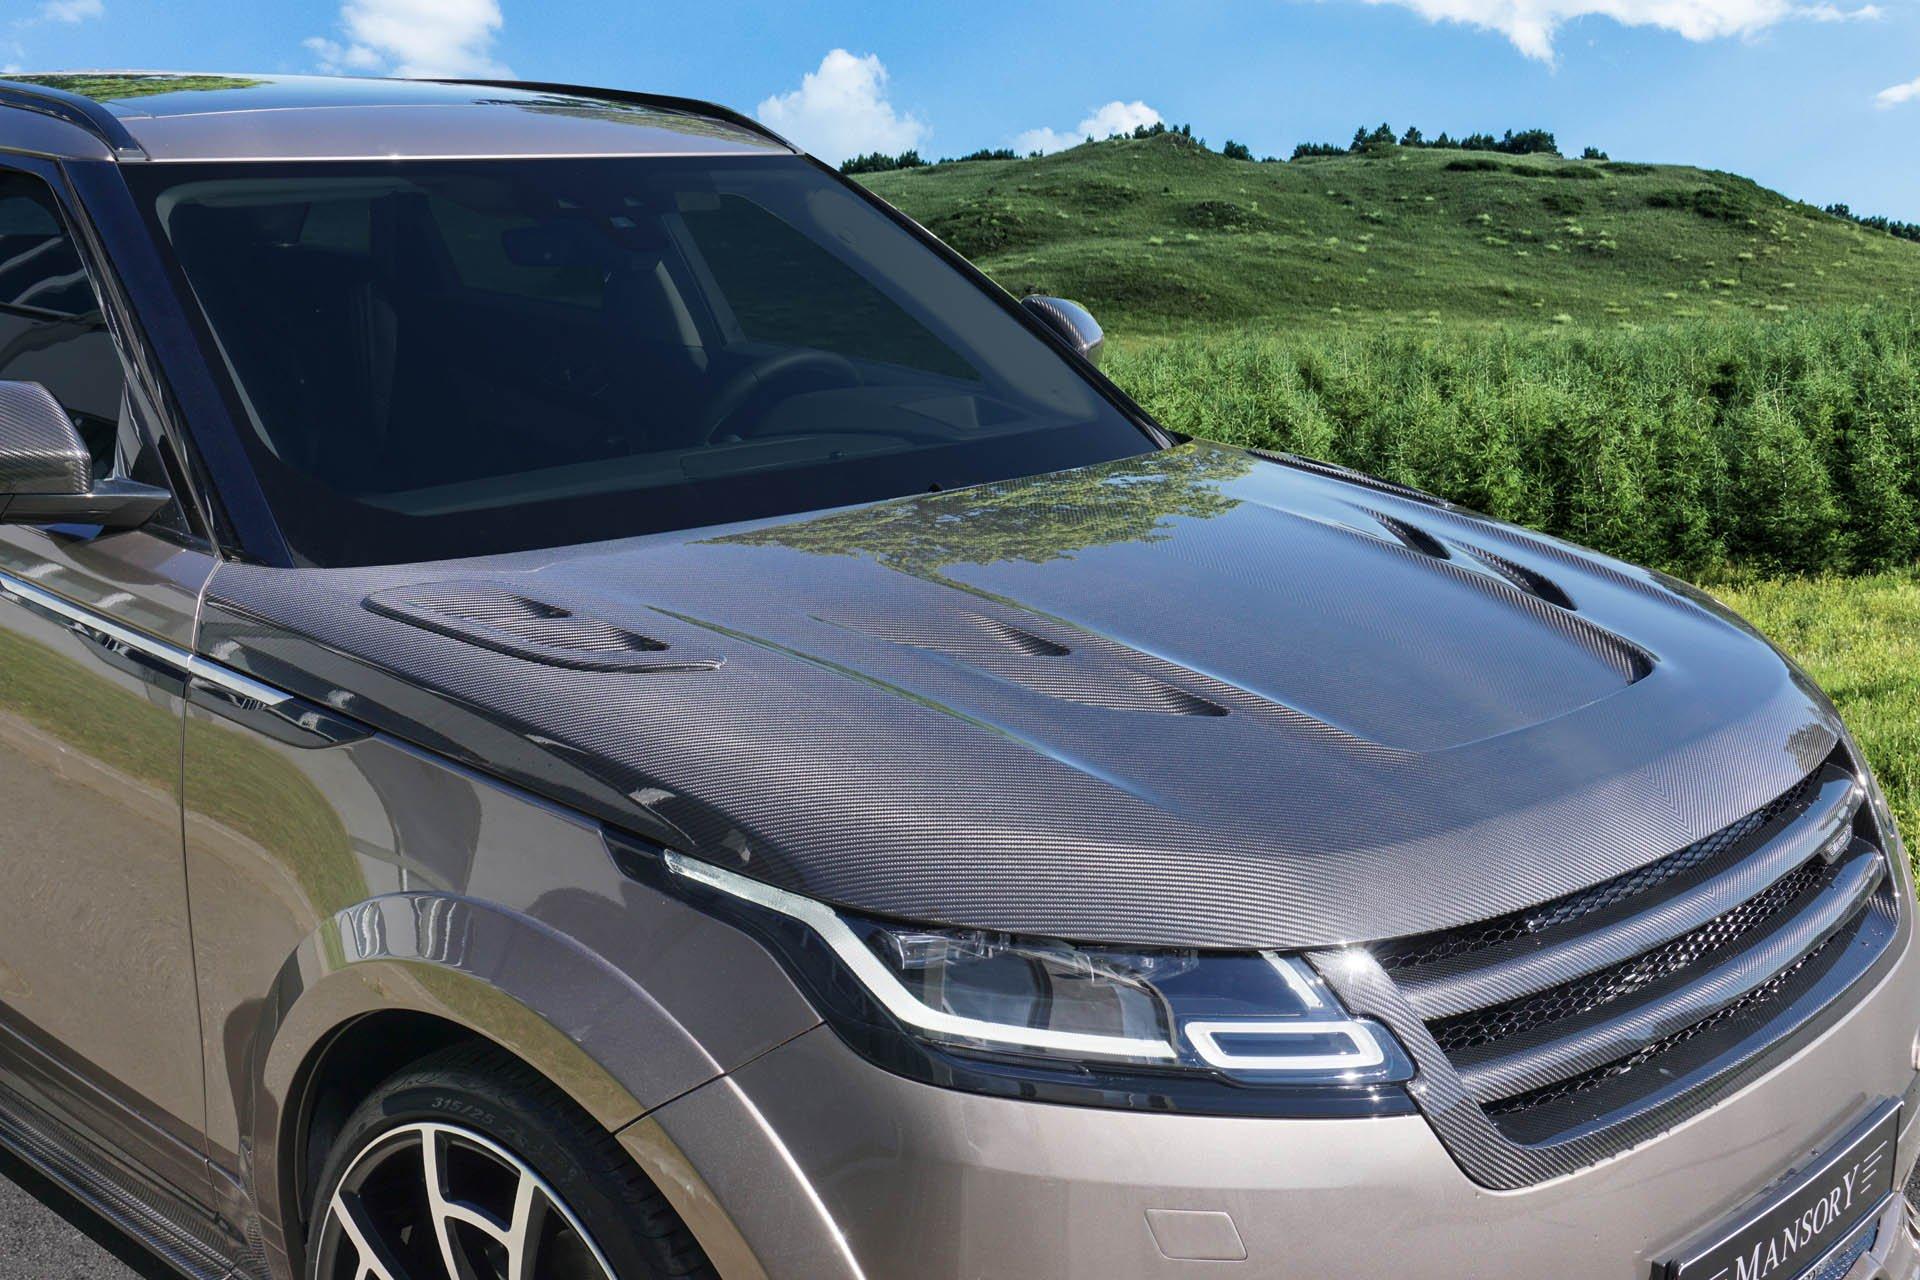 Range Rover Velar by Mansory (5)